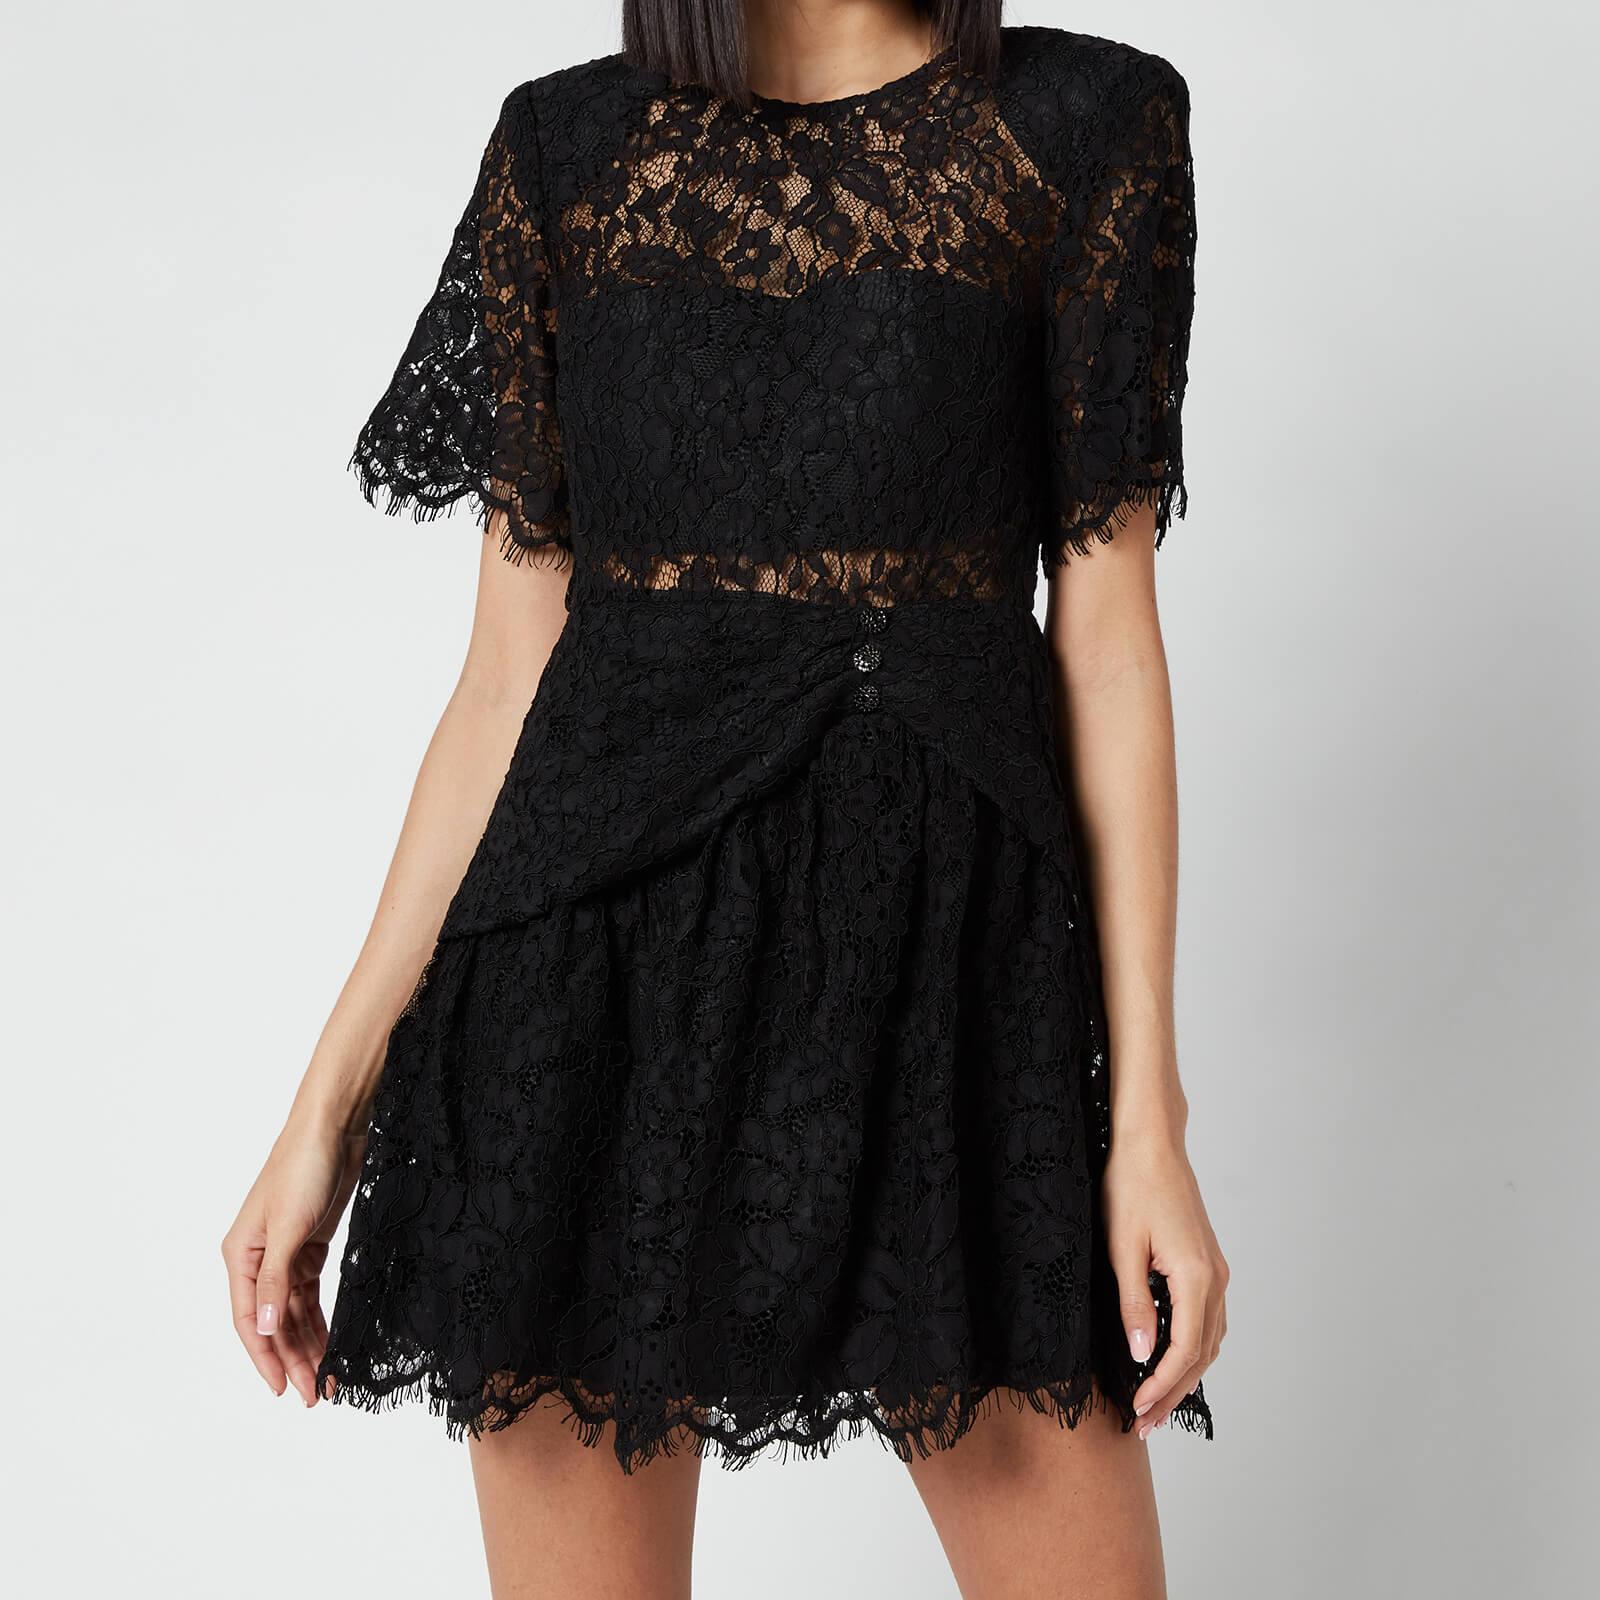 Self-Portrait Women's Fine Cord Sleeve Mini Dress - Black - UK 6